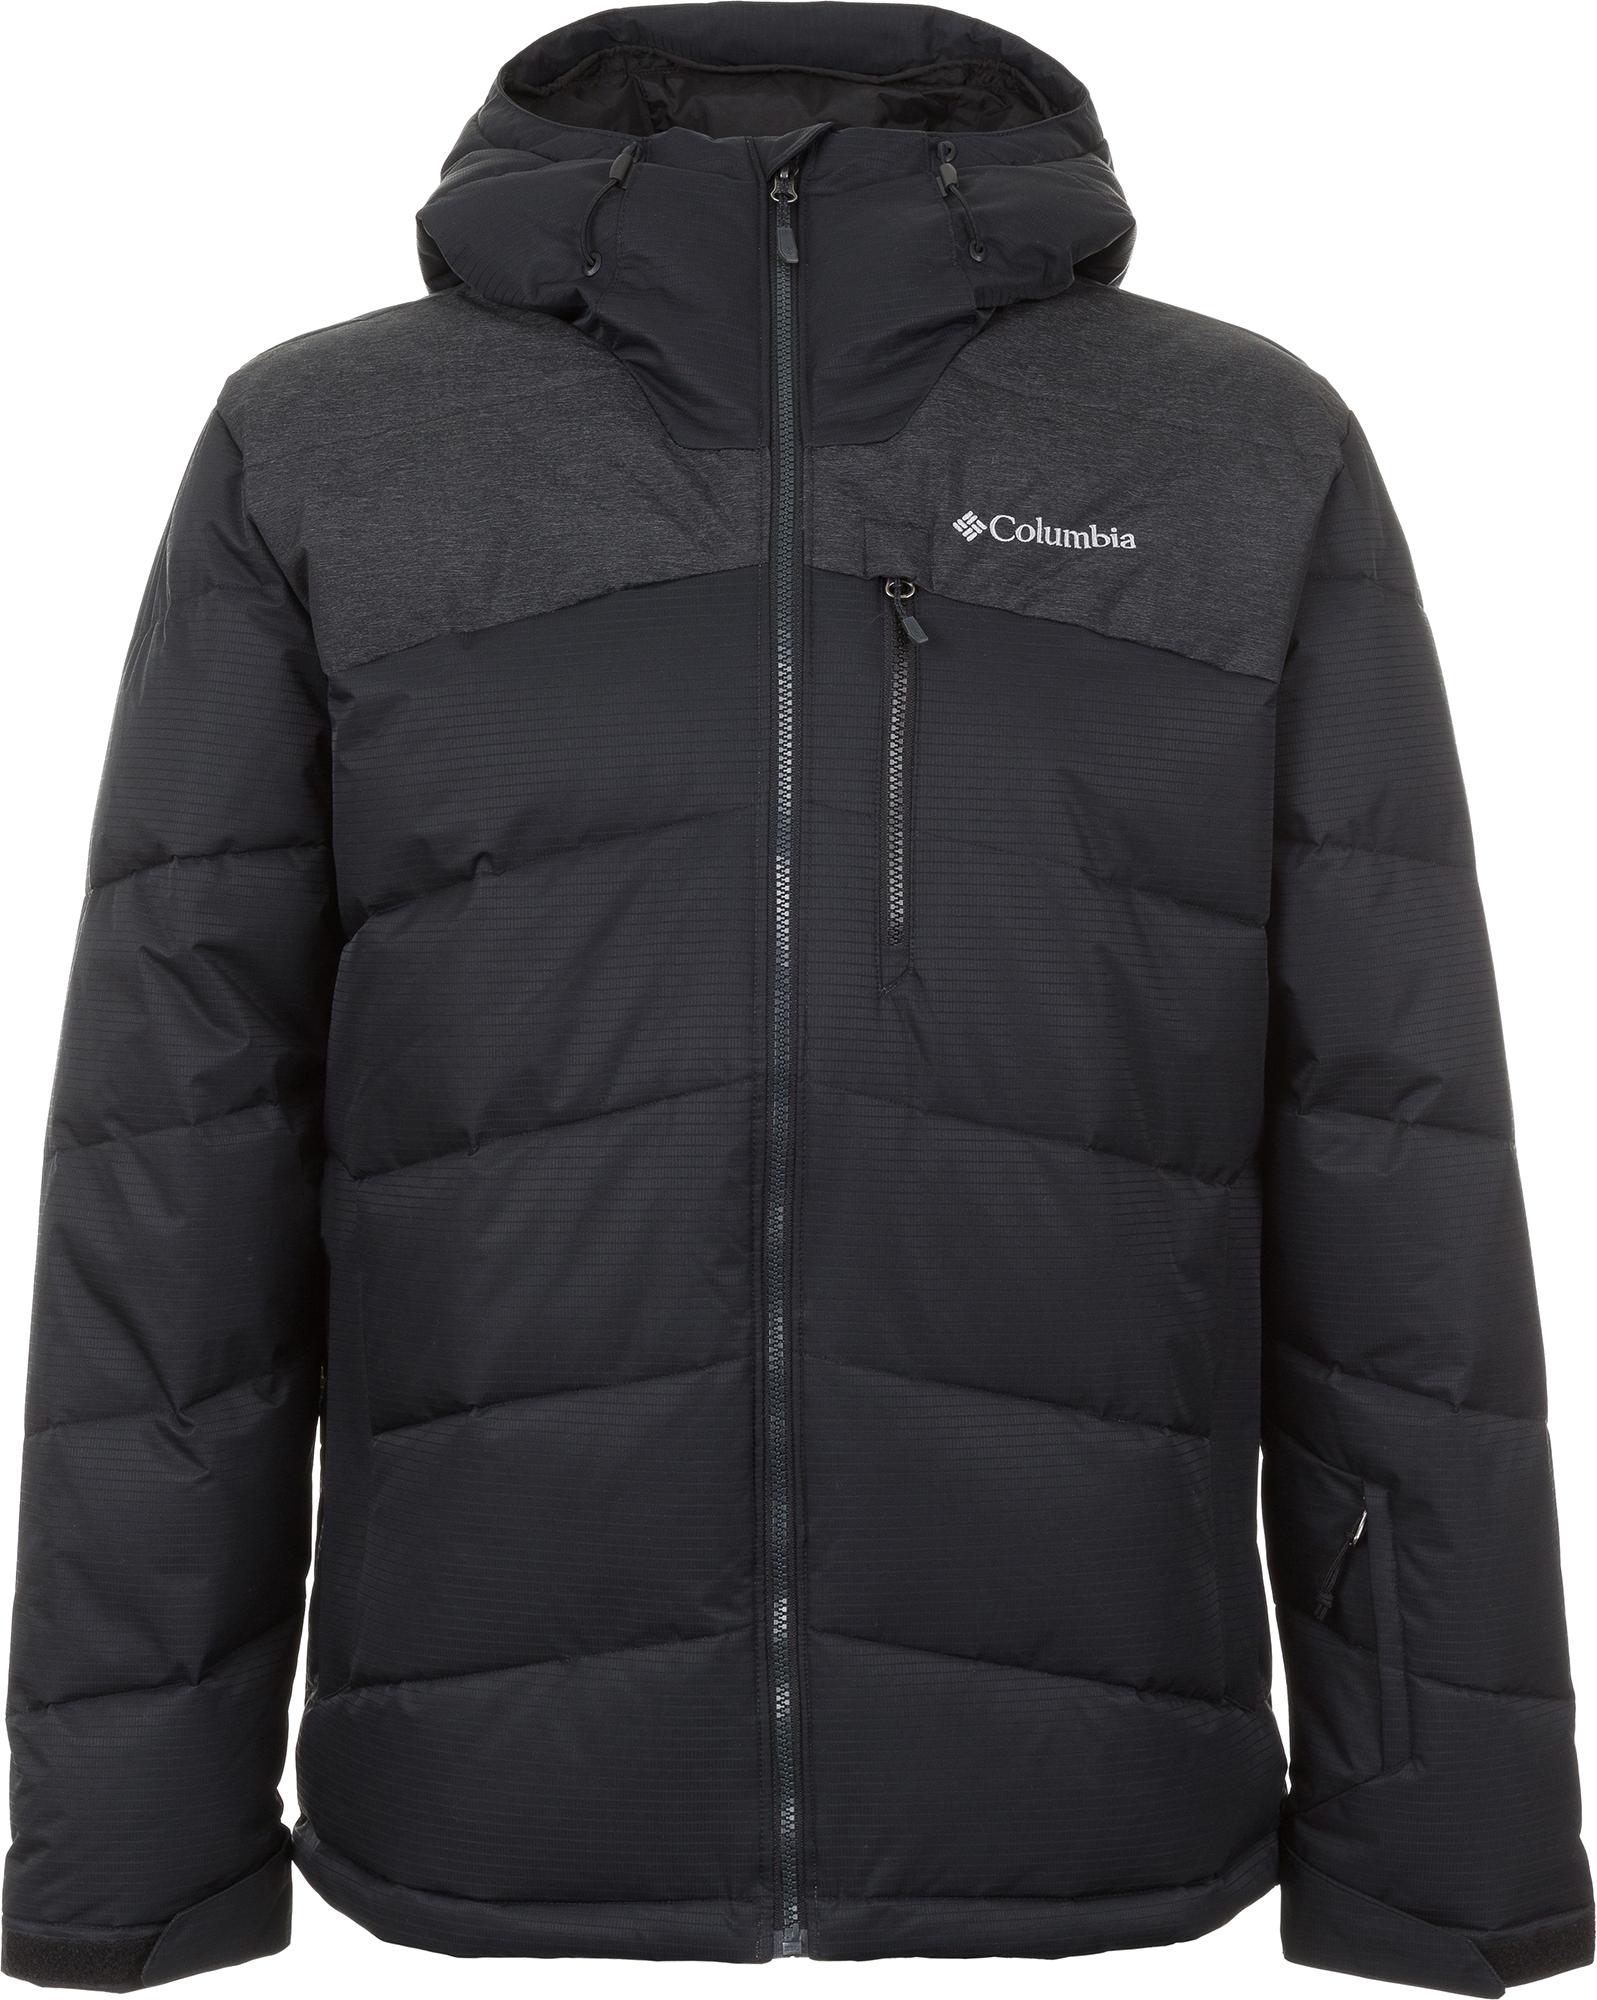 Columbia Куртка утепленная мужская Columbia Woolly Hollow II, размер 56-58 columbia куртка 3 в 1 мужская columbia whirlibird размер 48 50